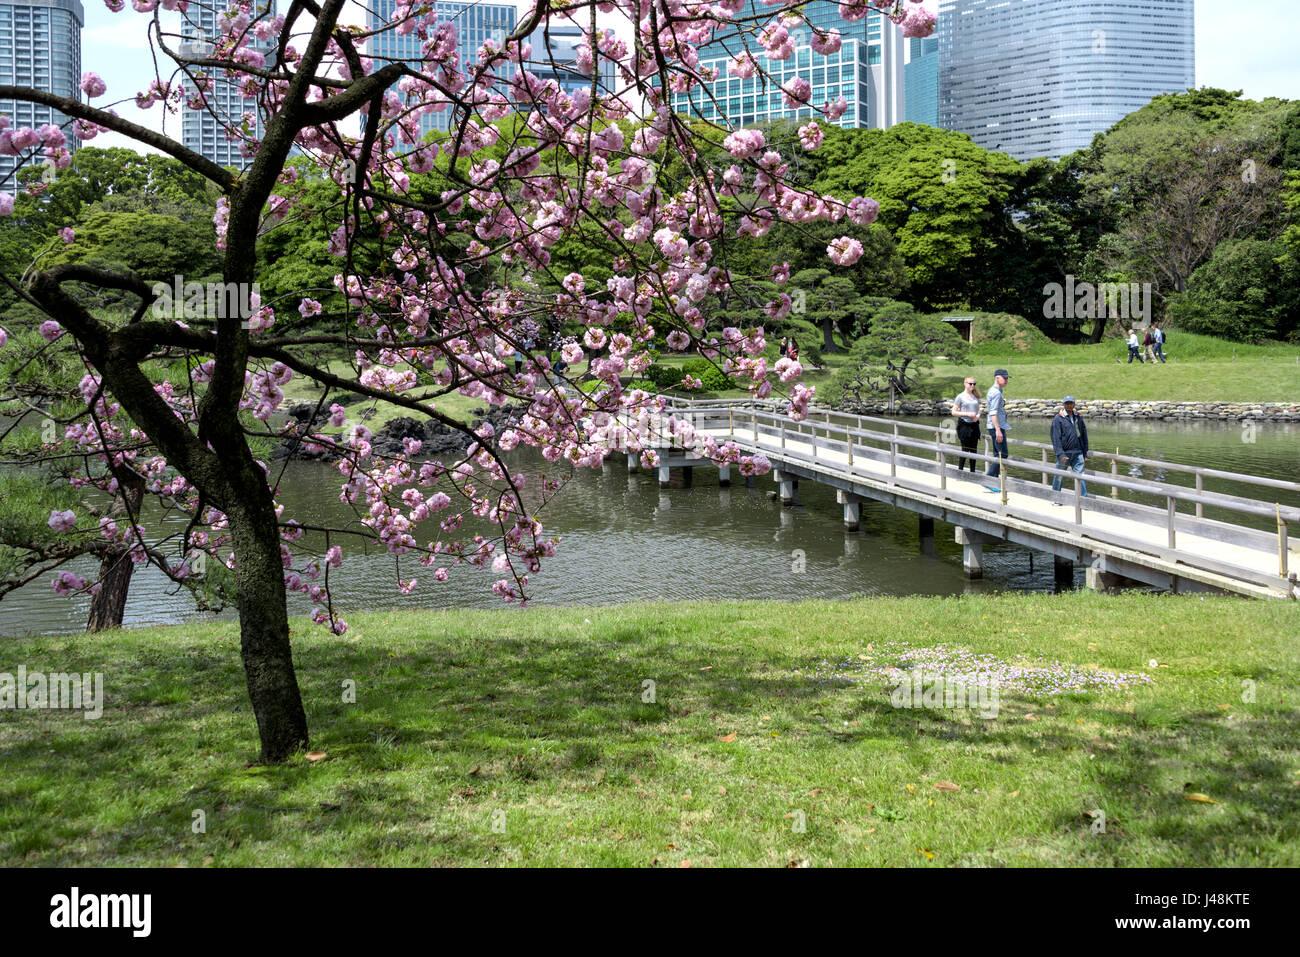 Hama Rikyu landscaped gardens Tokyo. - Stock Image